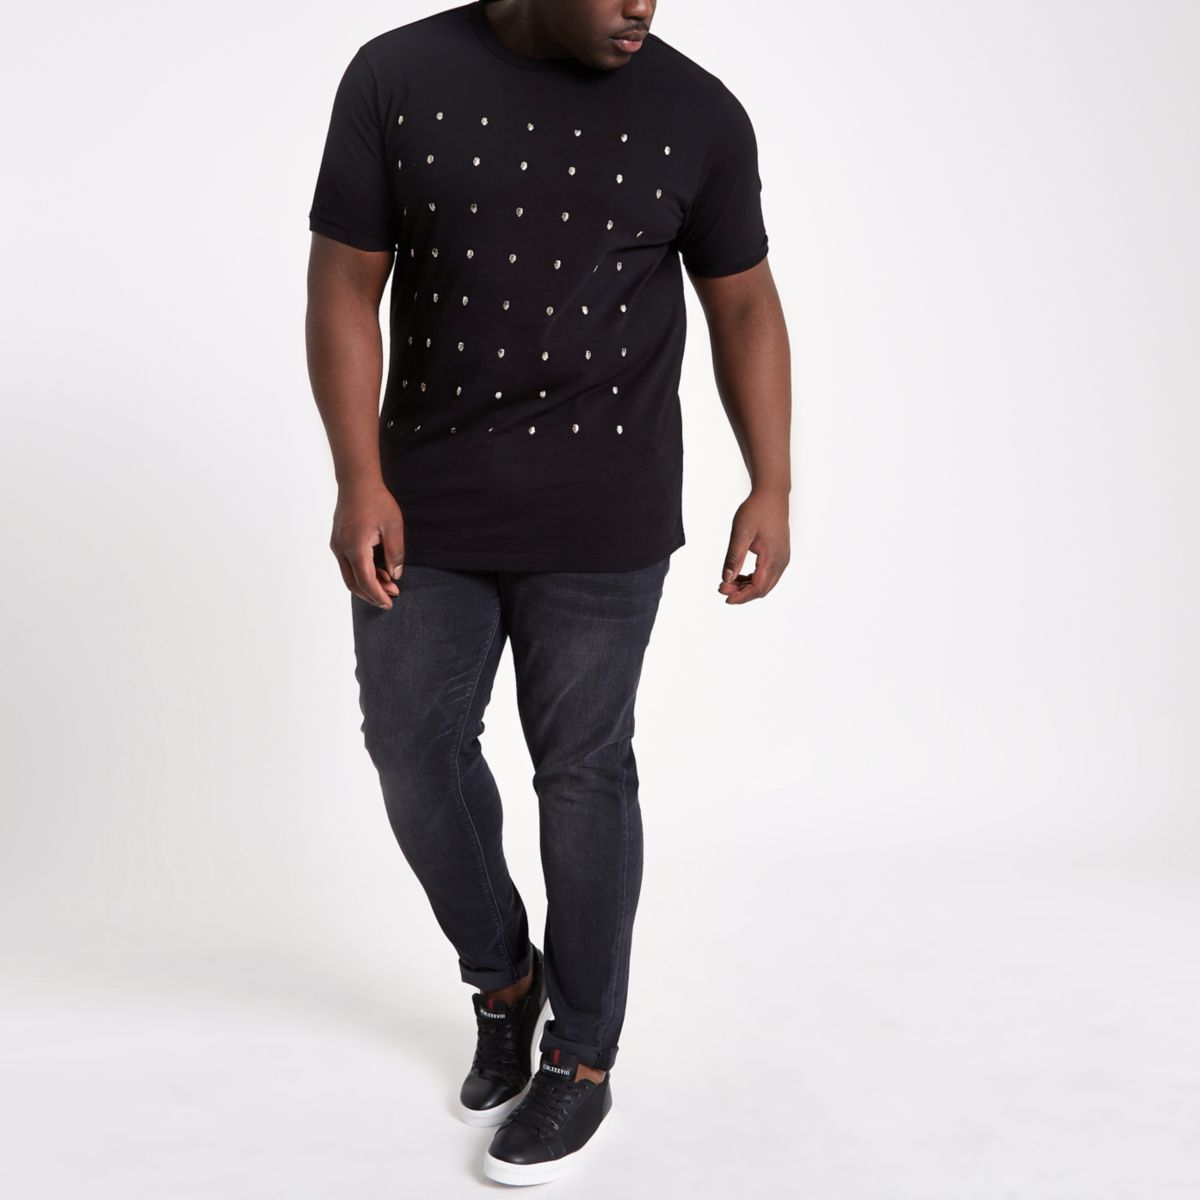 Schwarzes T-Shirt mit Totenkopf-Motiv